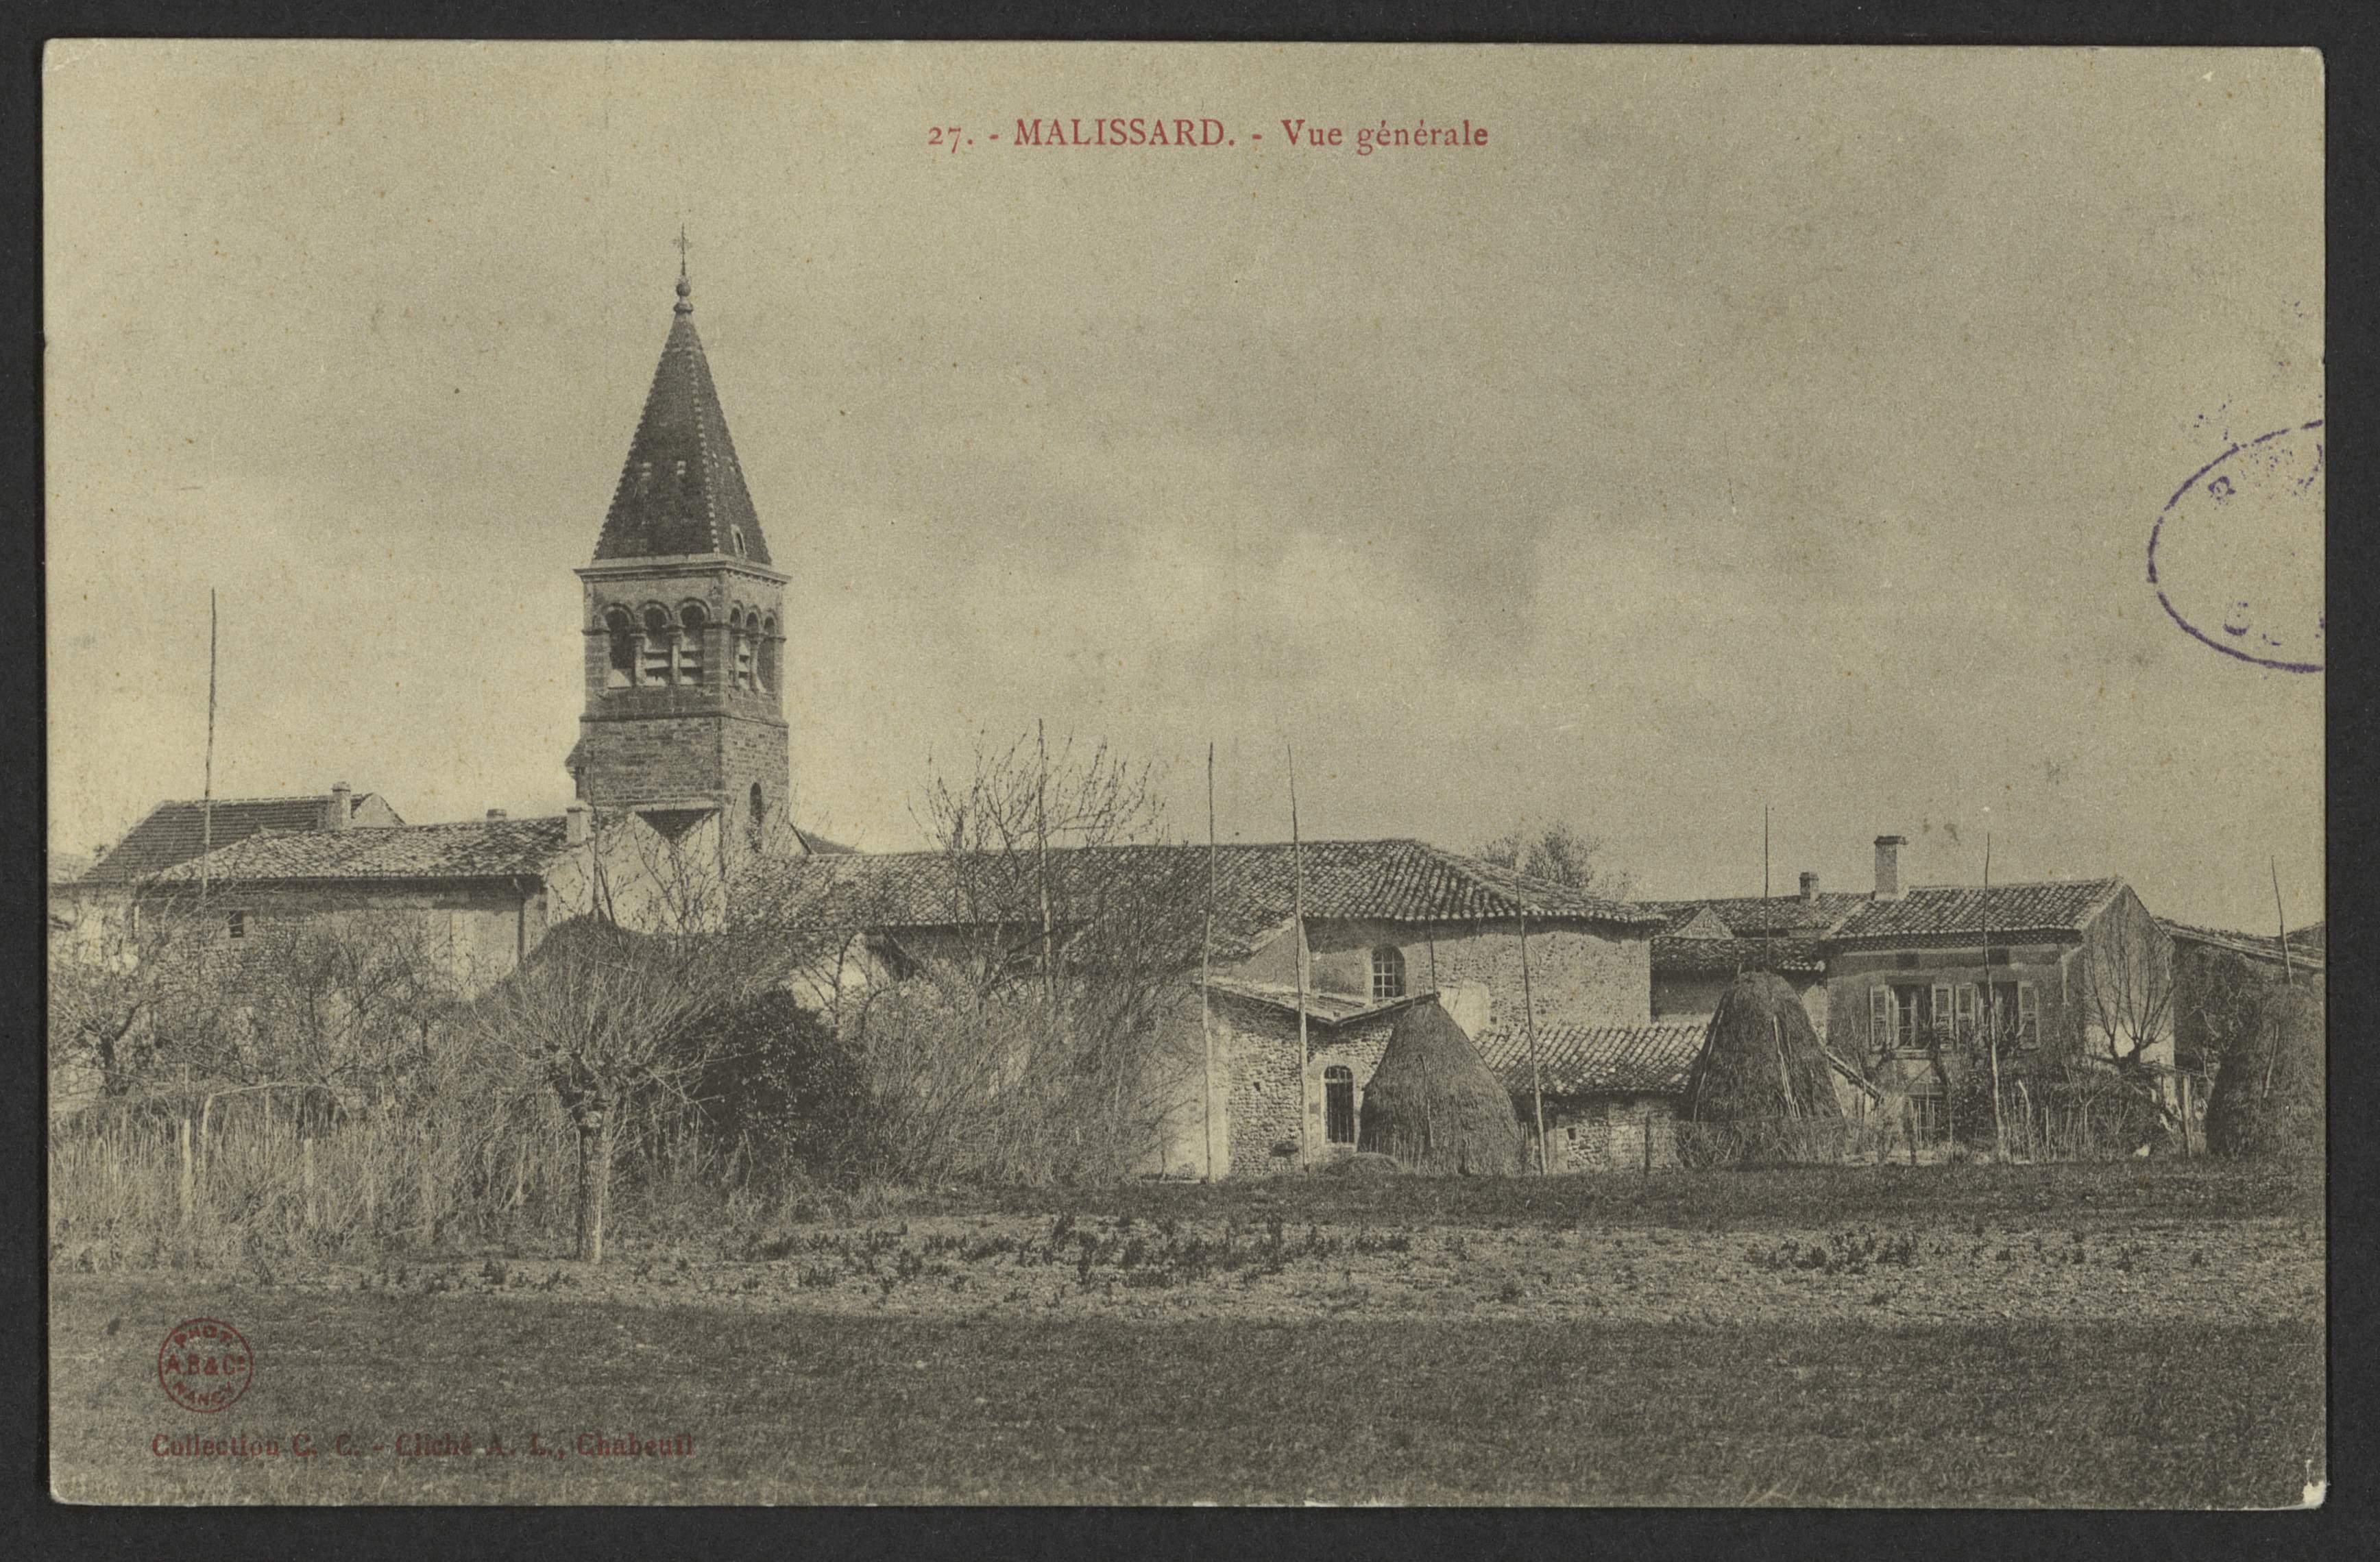 Malissard - Vue générale